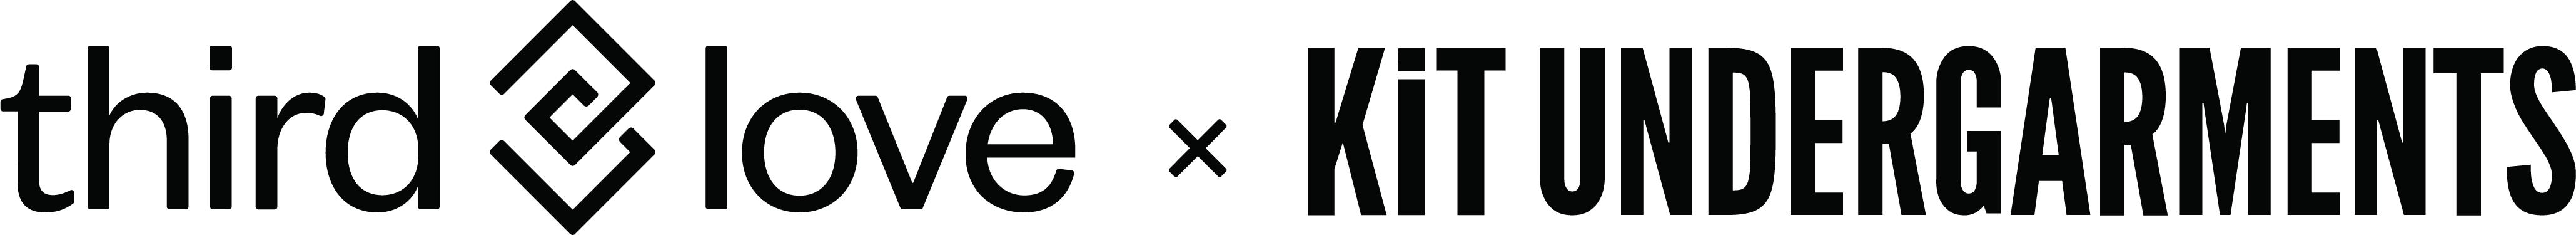 TL x Kit logo.png